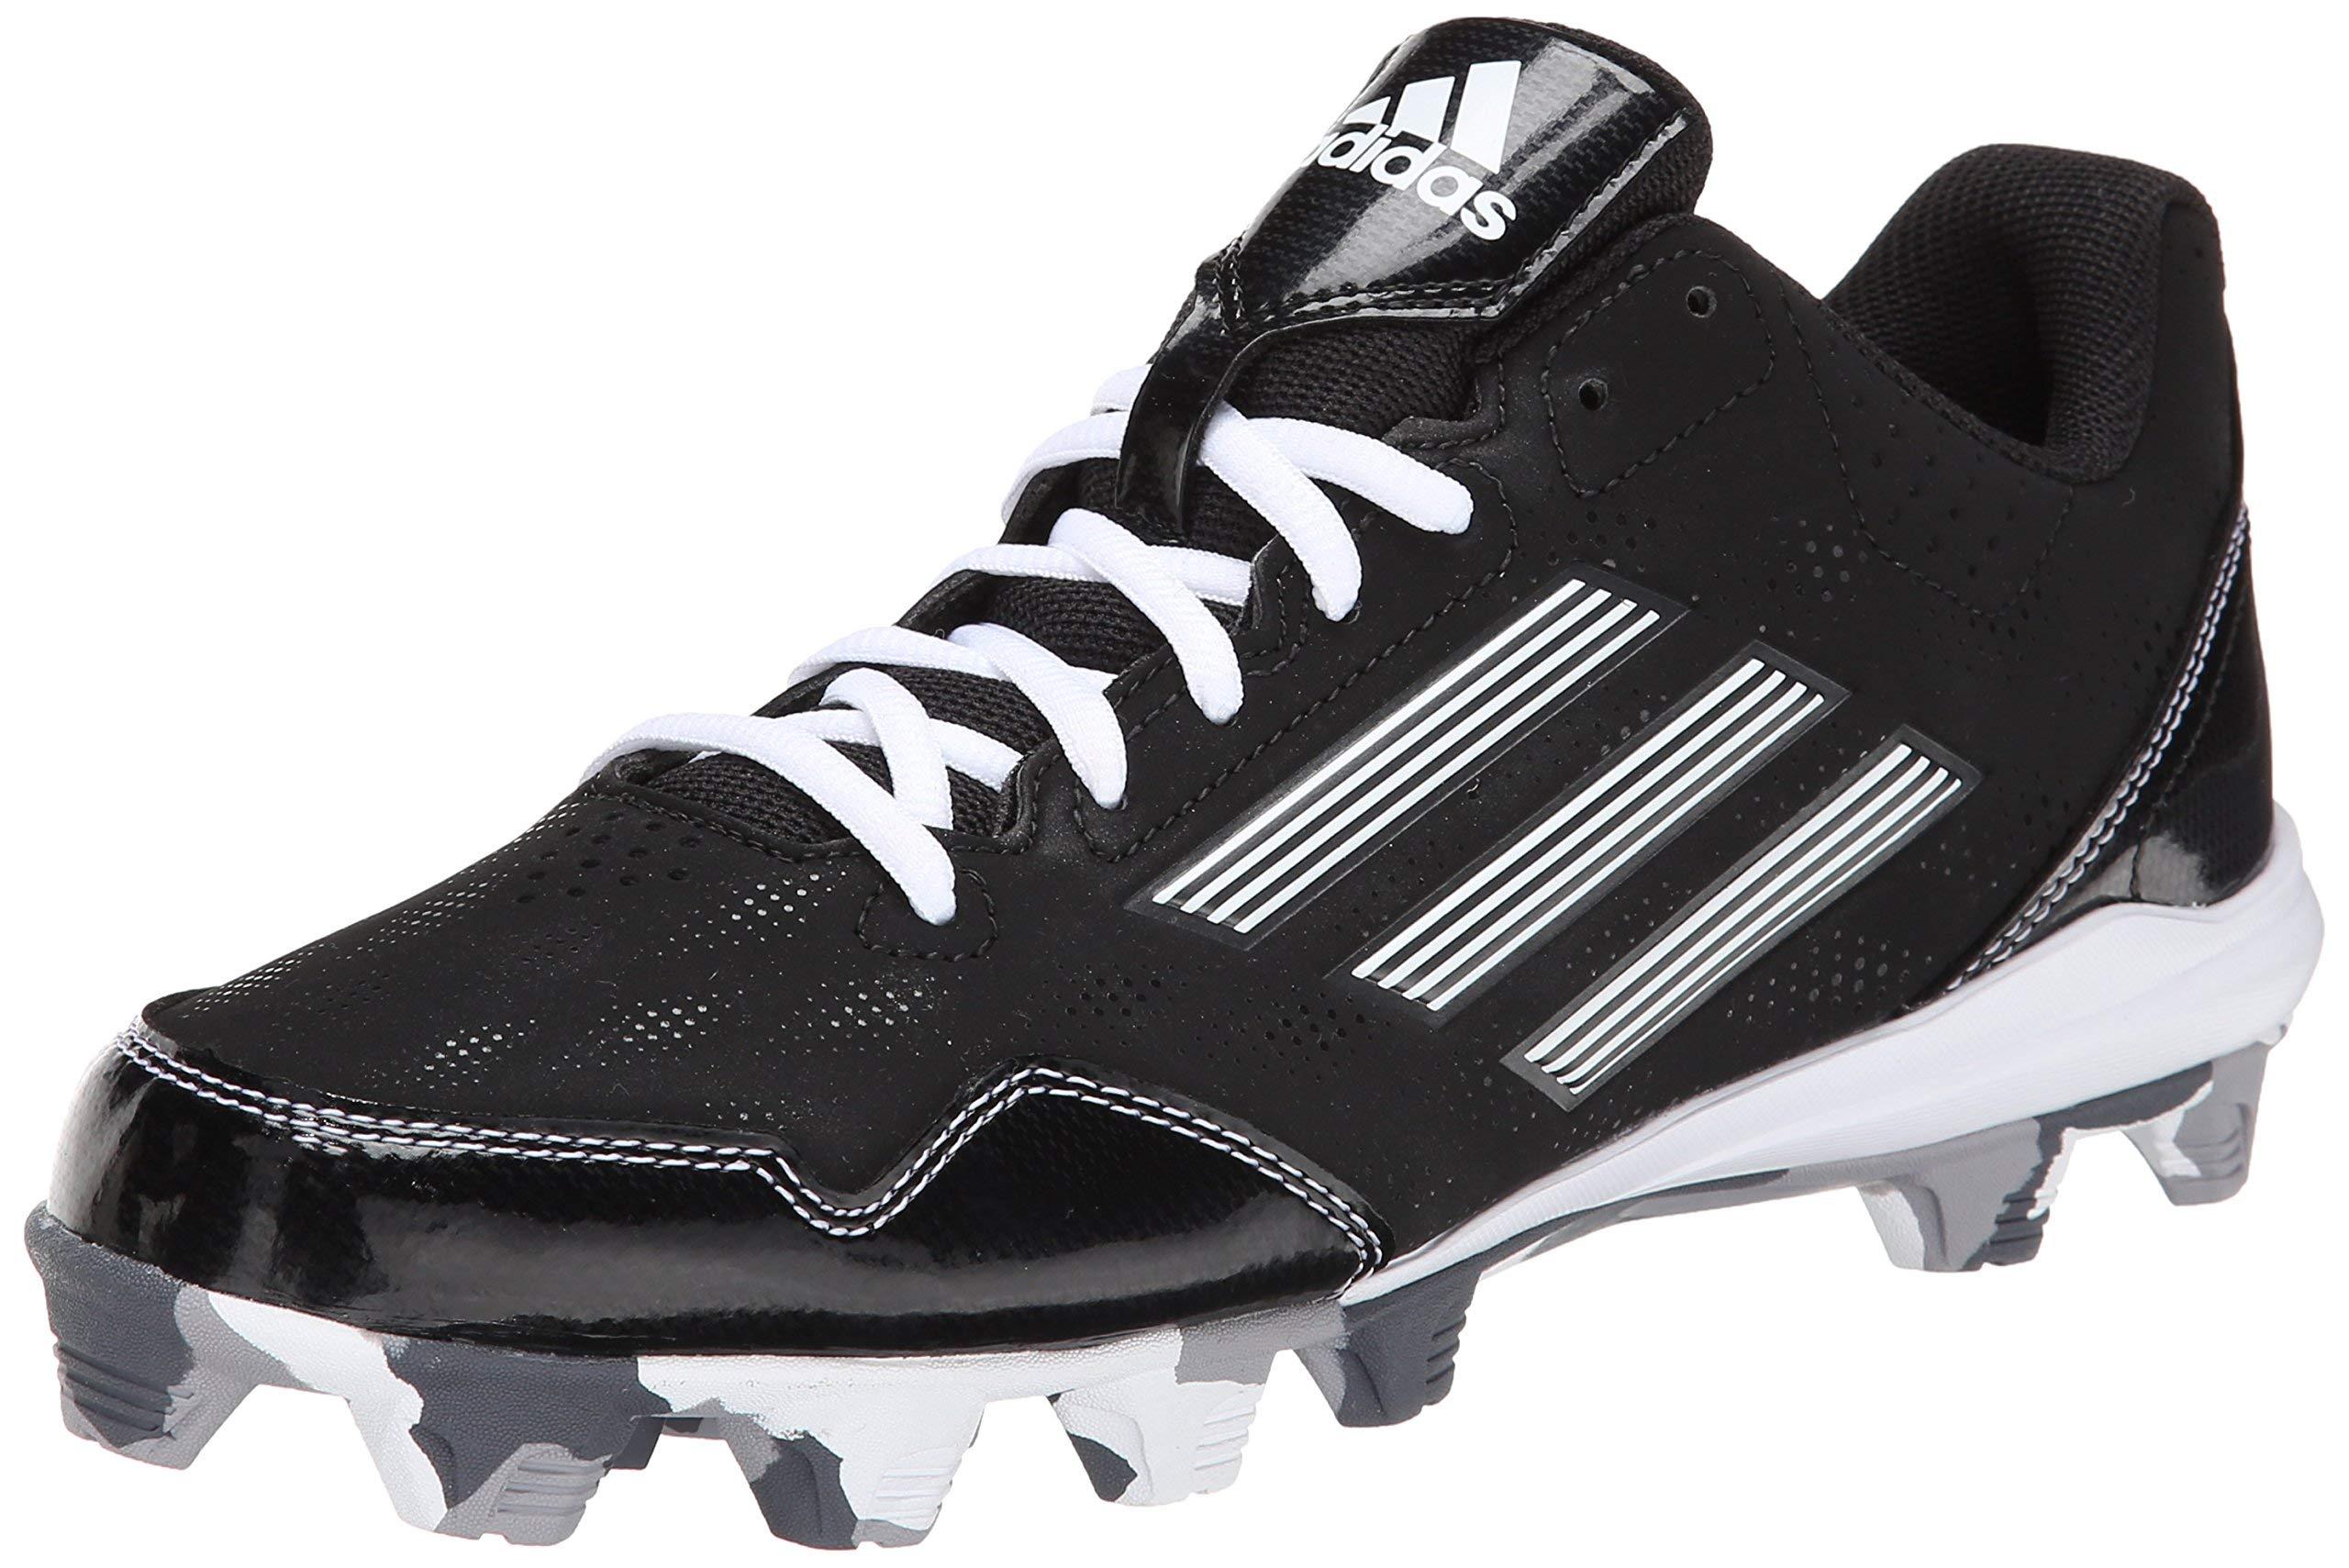 adidas Performance Men's Wheelhouse 2 Baseball Cleat, Black/White, 6.5 M US by adidas